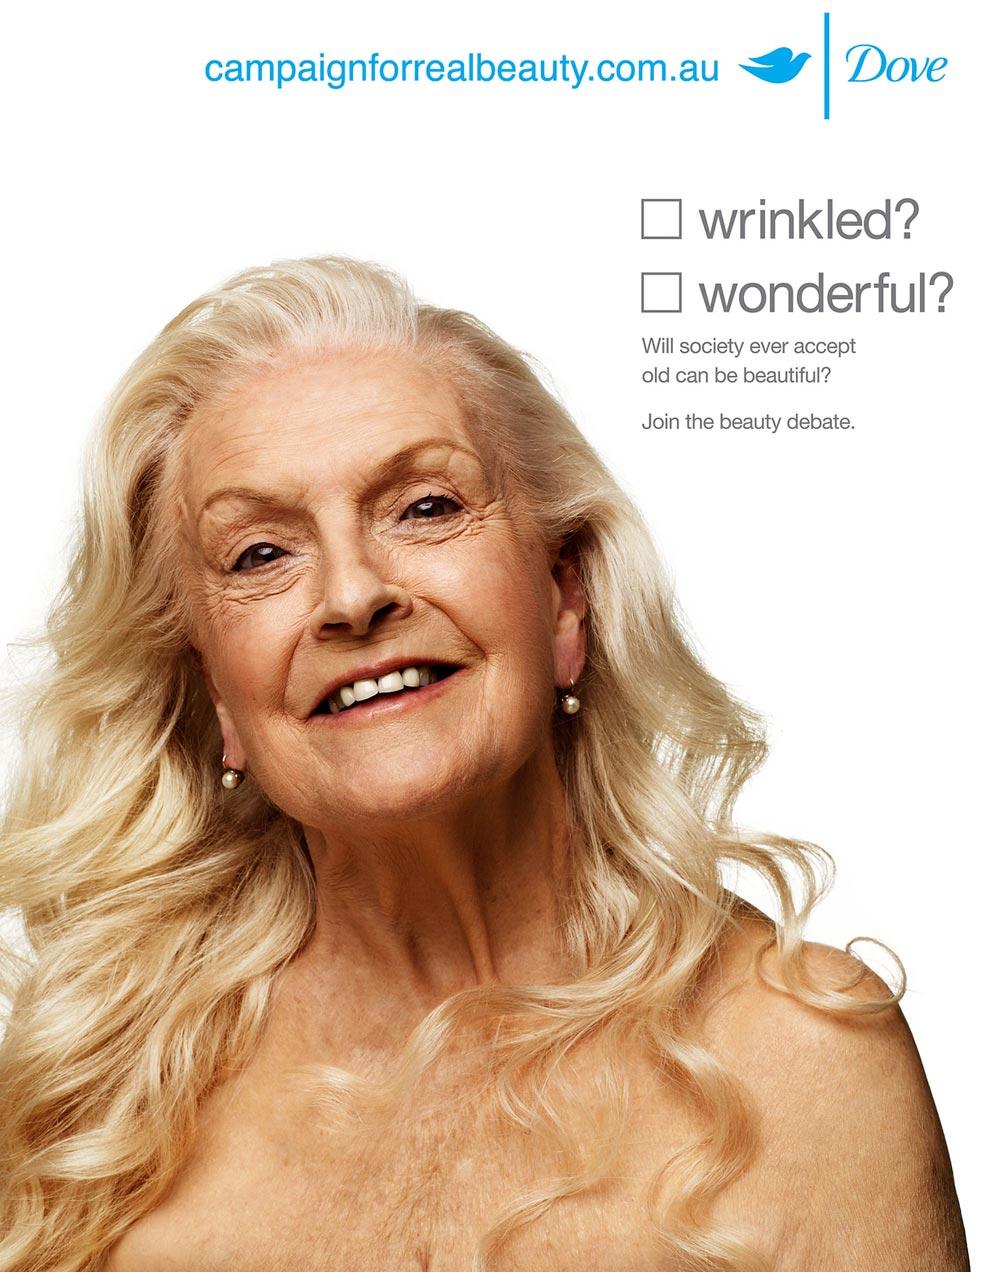 dove-old-woman-copy.jpg